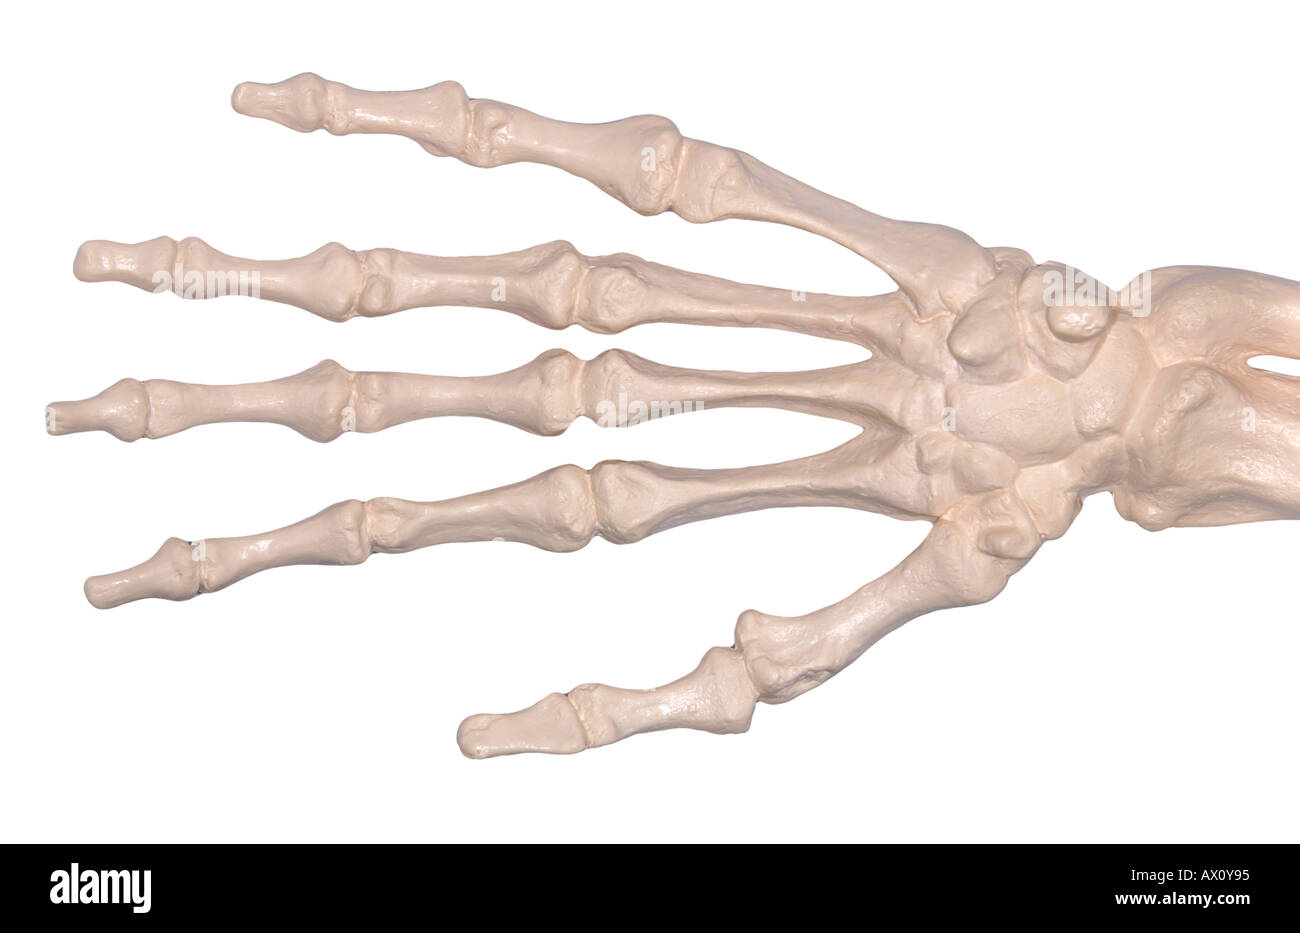 Skeleton Hand Stock Photos & Skeleton Hand Stock Images - Alamy